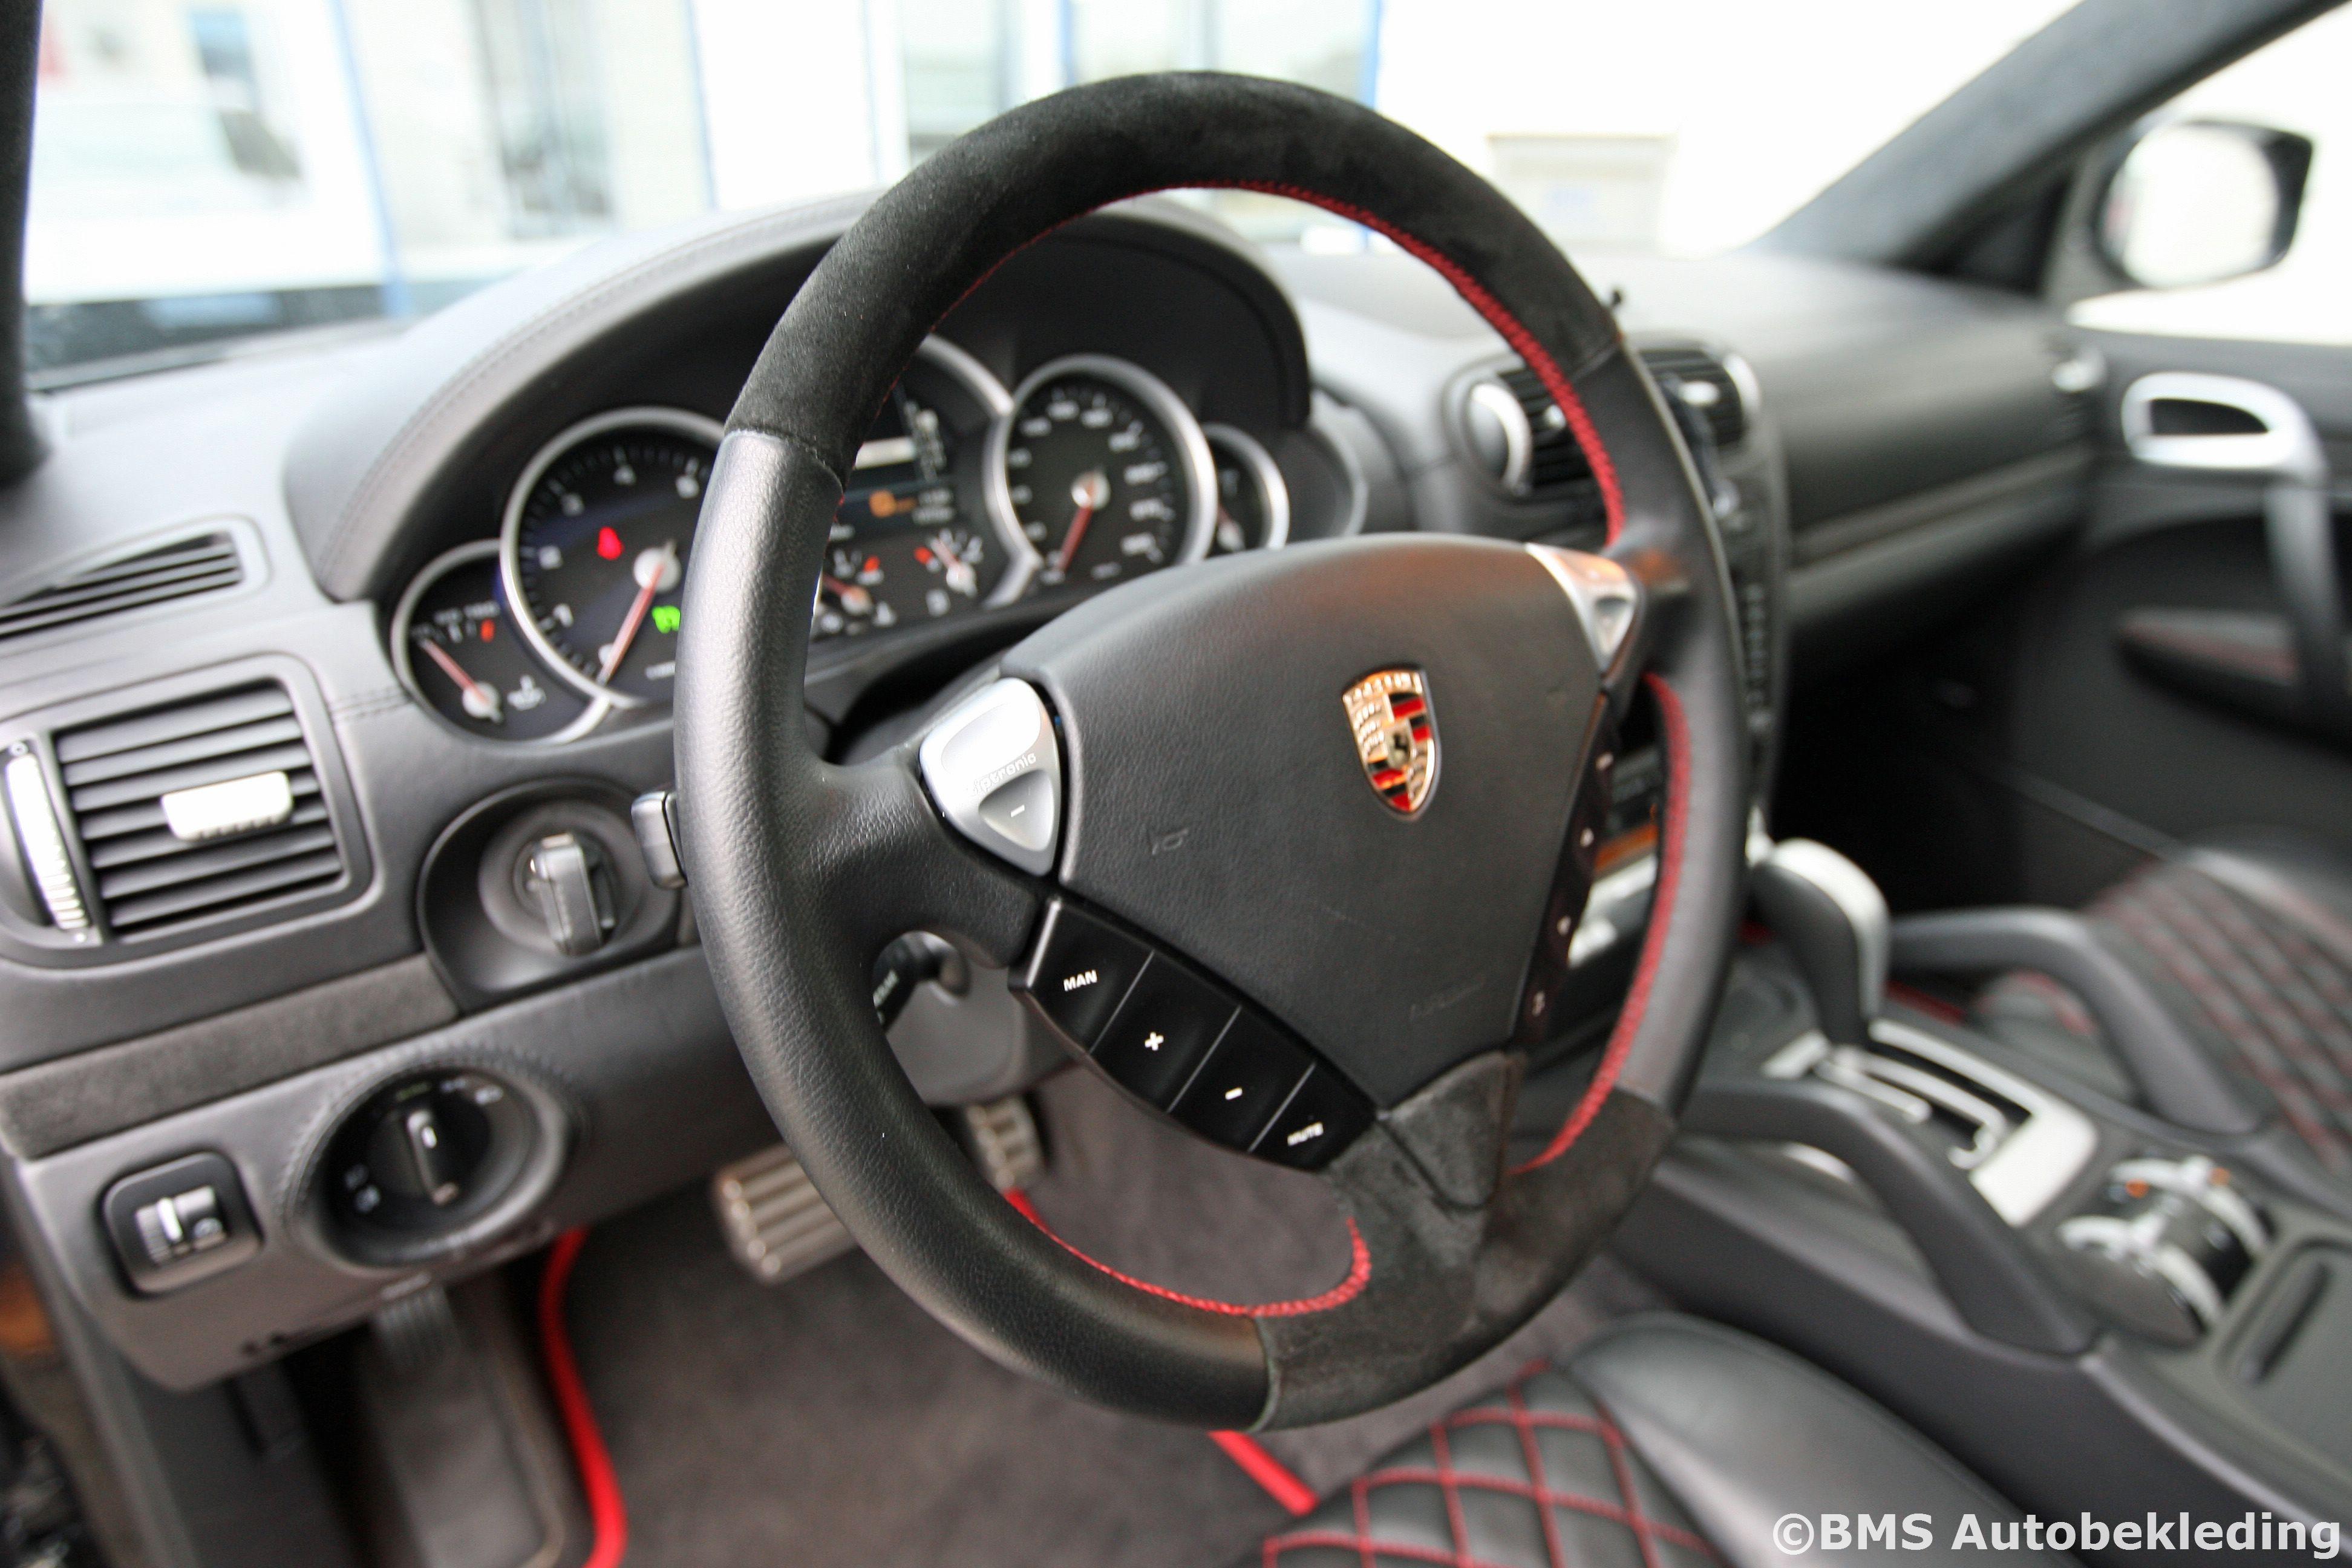 Bekleden van stuur, pookhoes of handremhoes | BMS Autobekleding